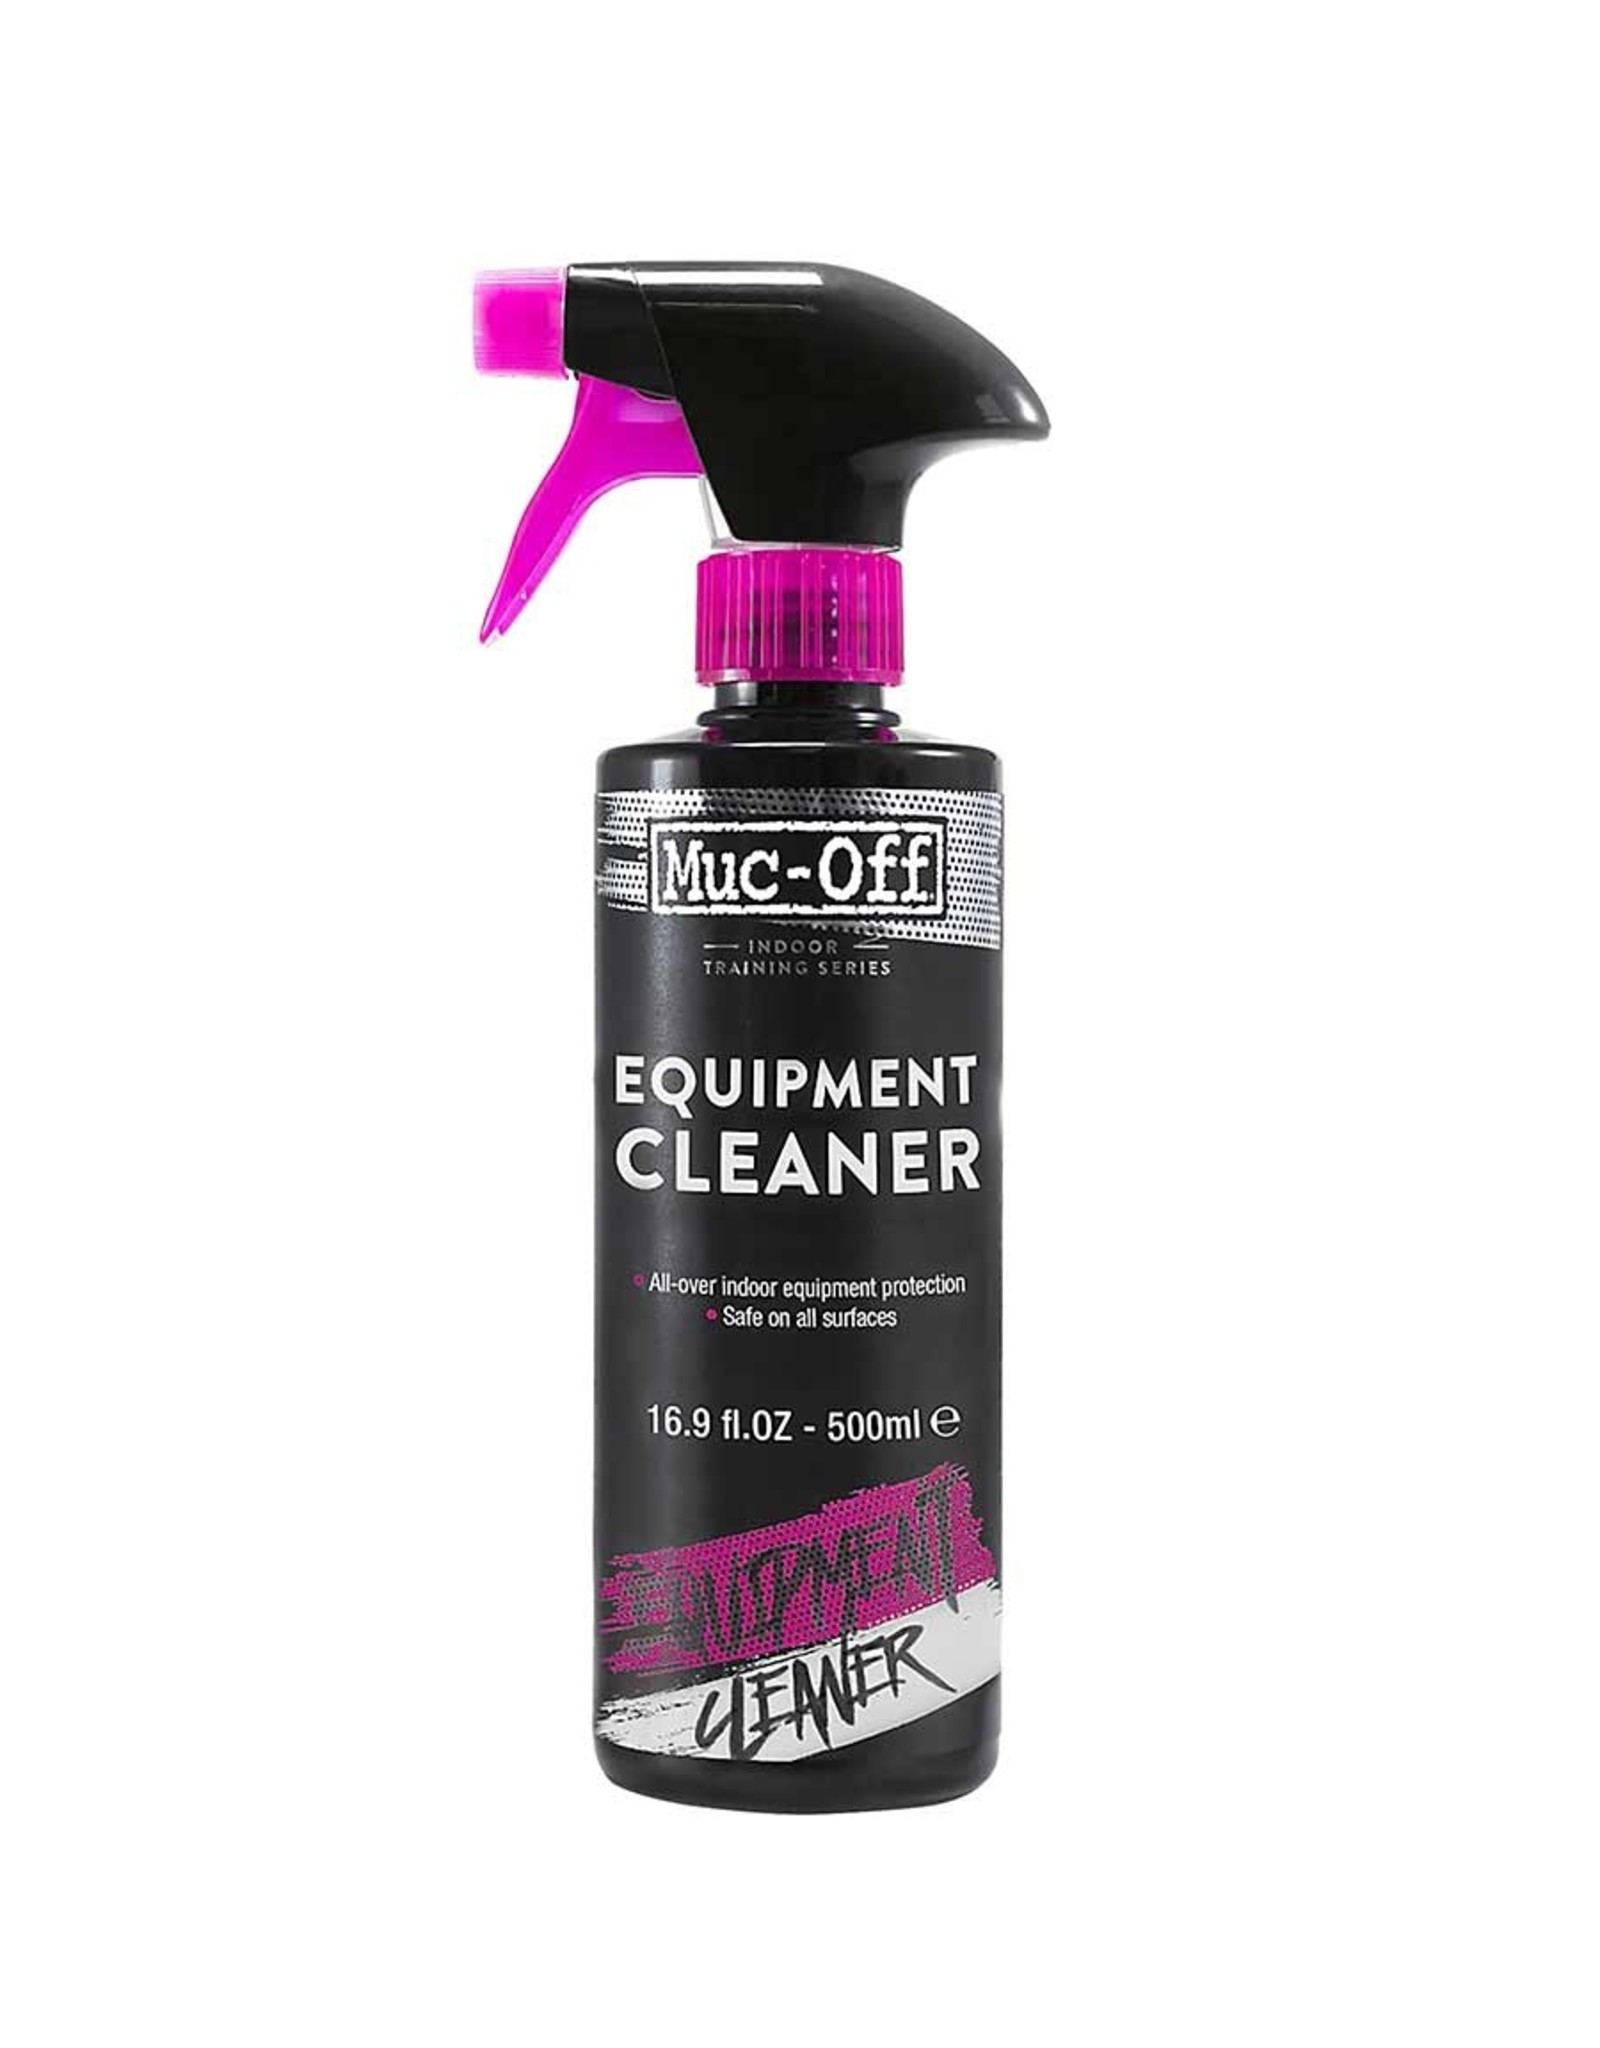 Muc-Off Muc-Off, Equipment Cleaner, 500ml